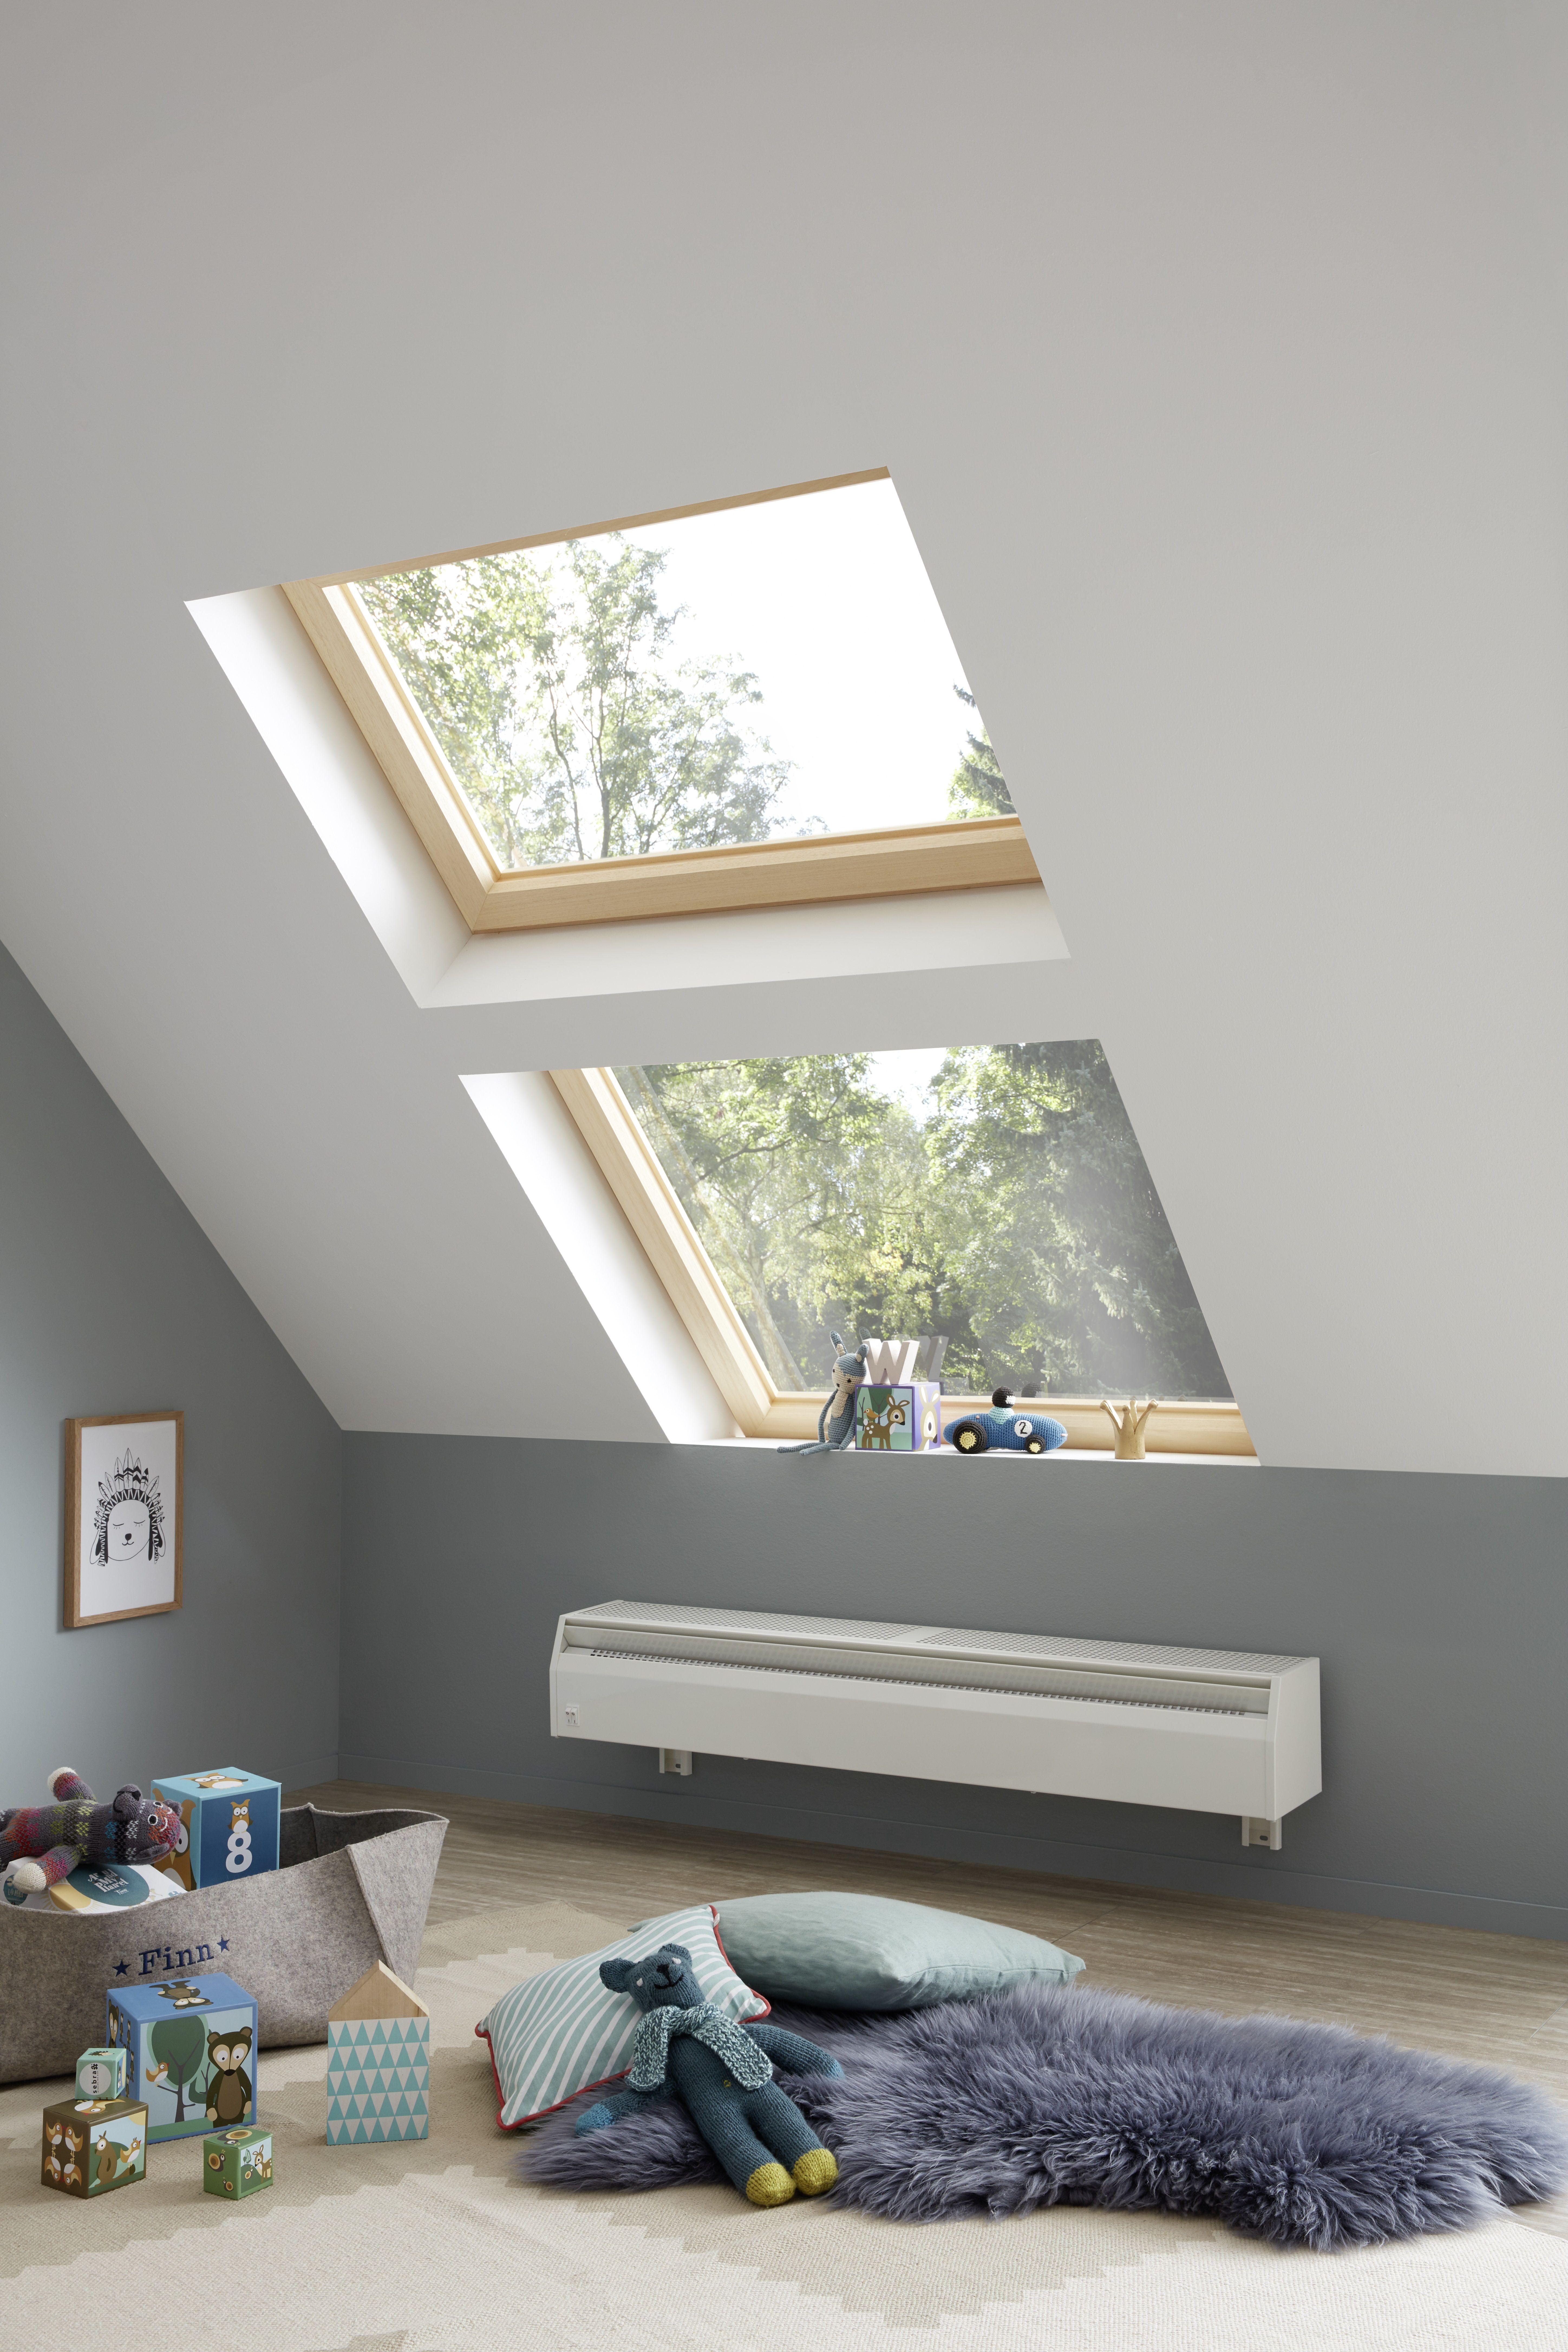 Ideal Fur Den Dachbodenausbau Dachschrage Fenster Badezimmer Dachschrage Dachbodenausbau